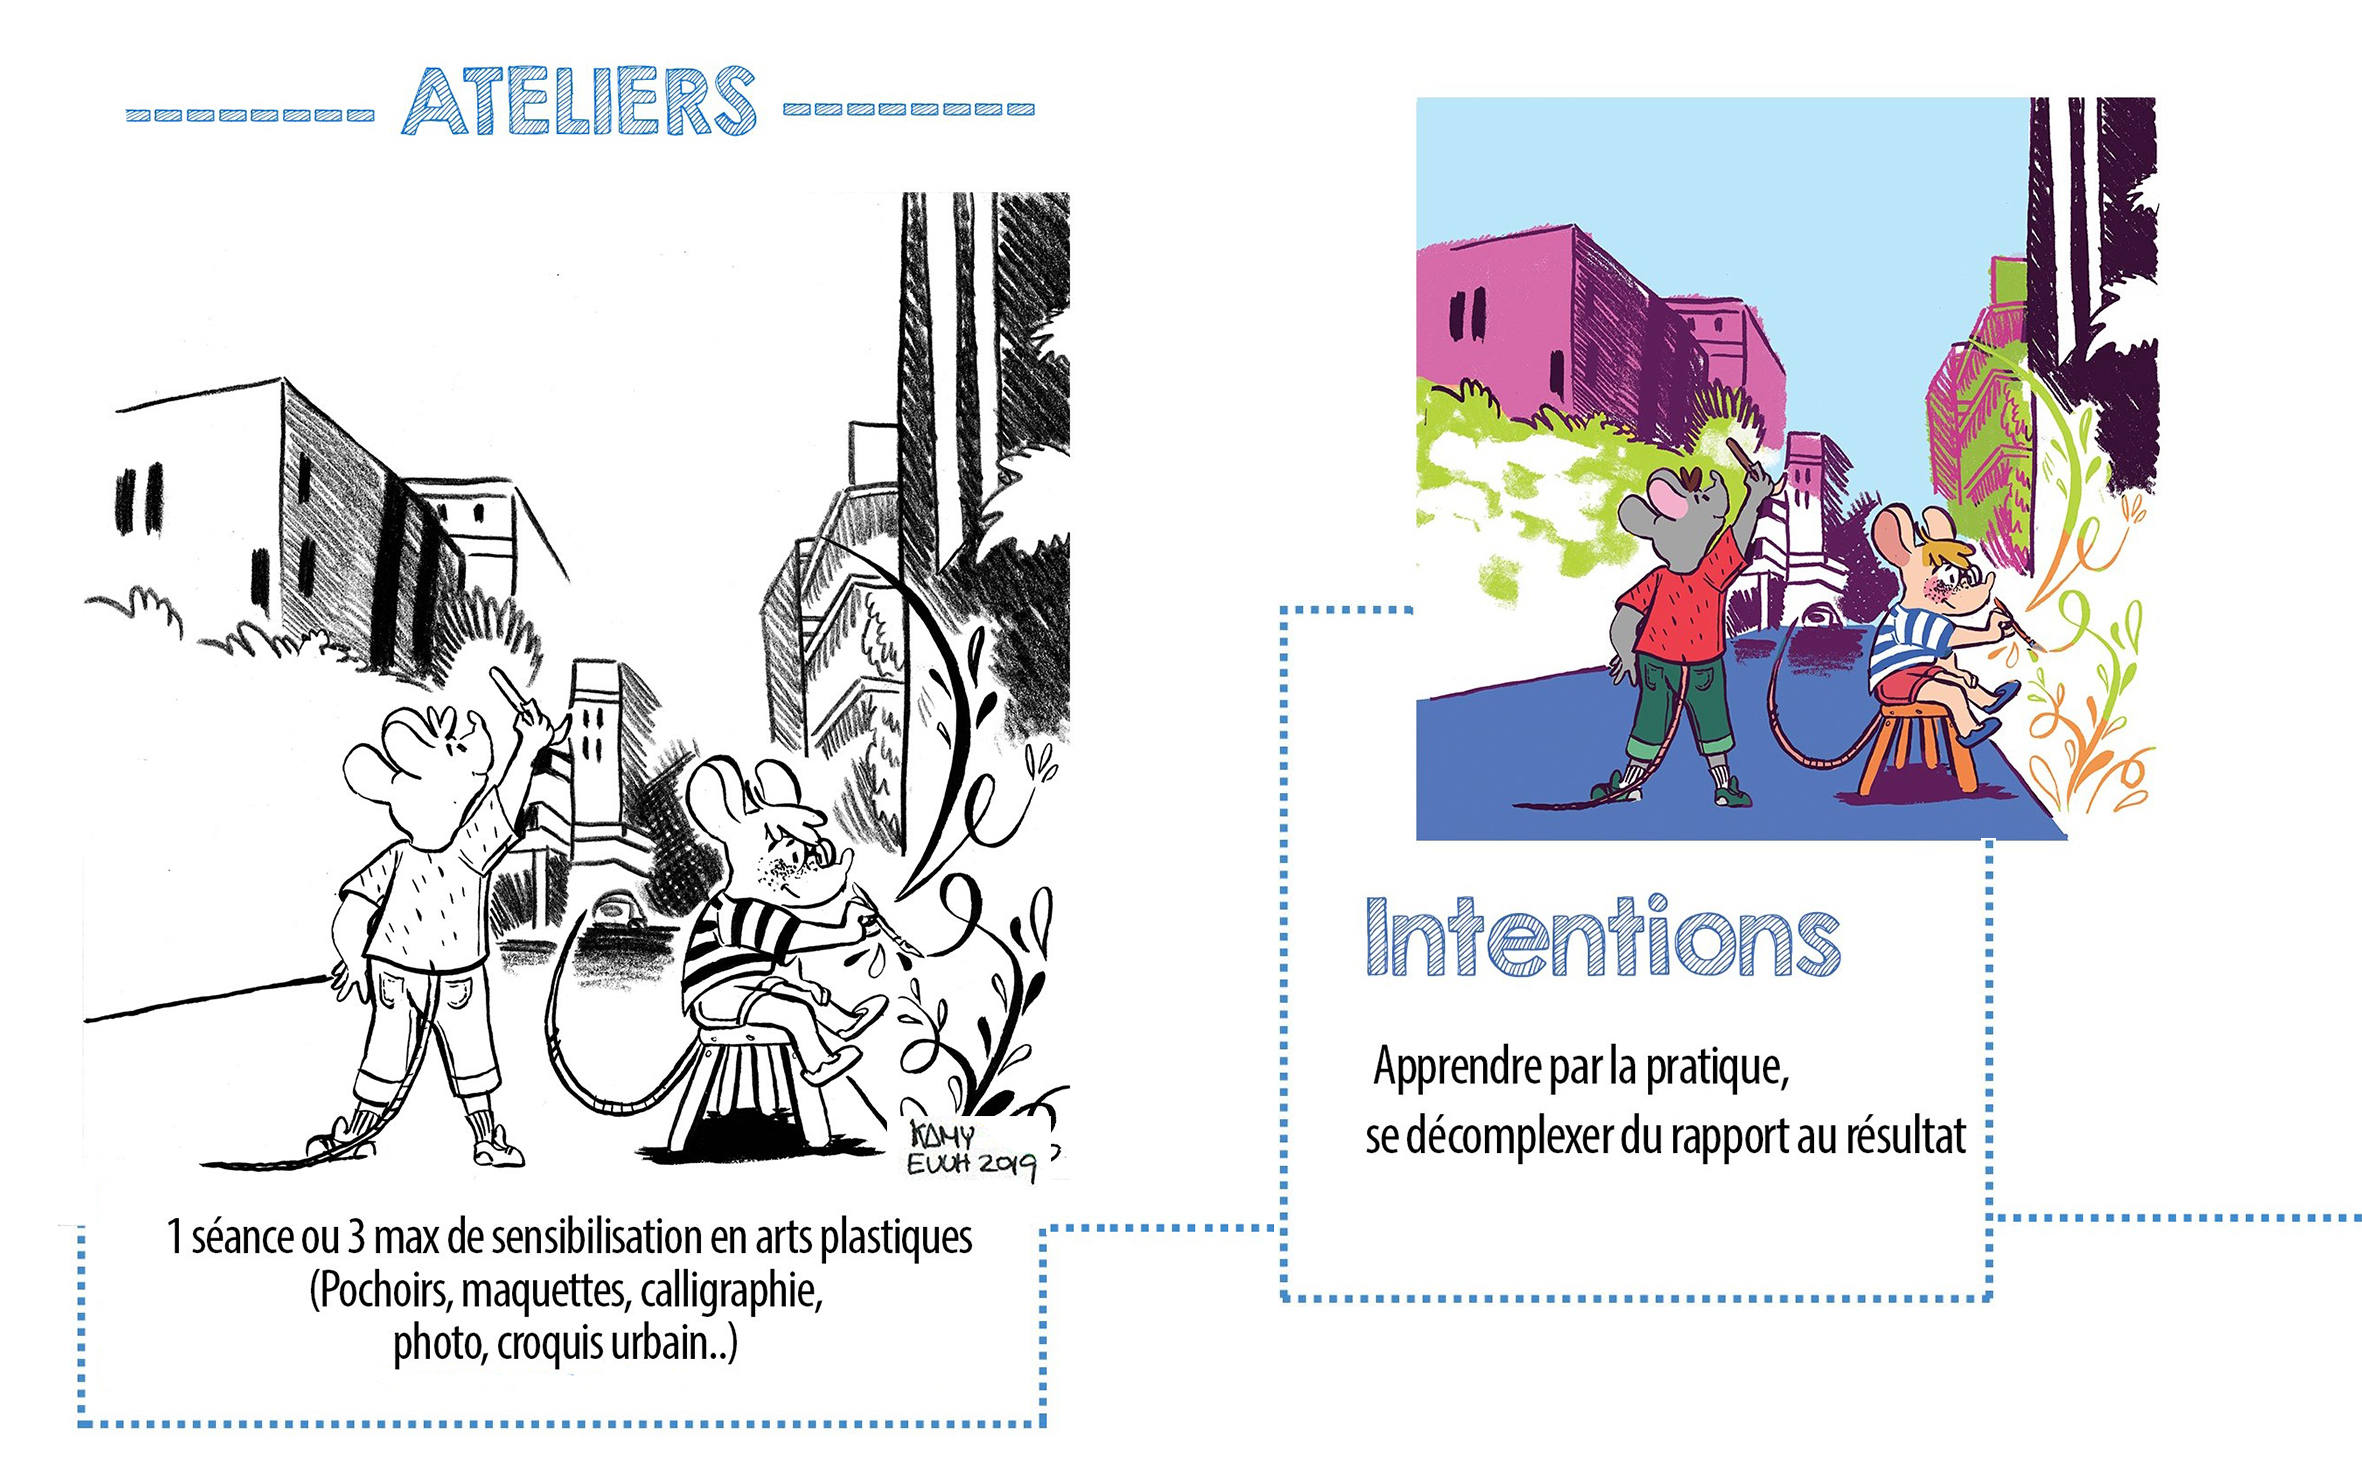 bandeau-Ateliers-PREFIGURATIONS-V2-F